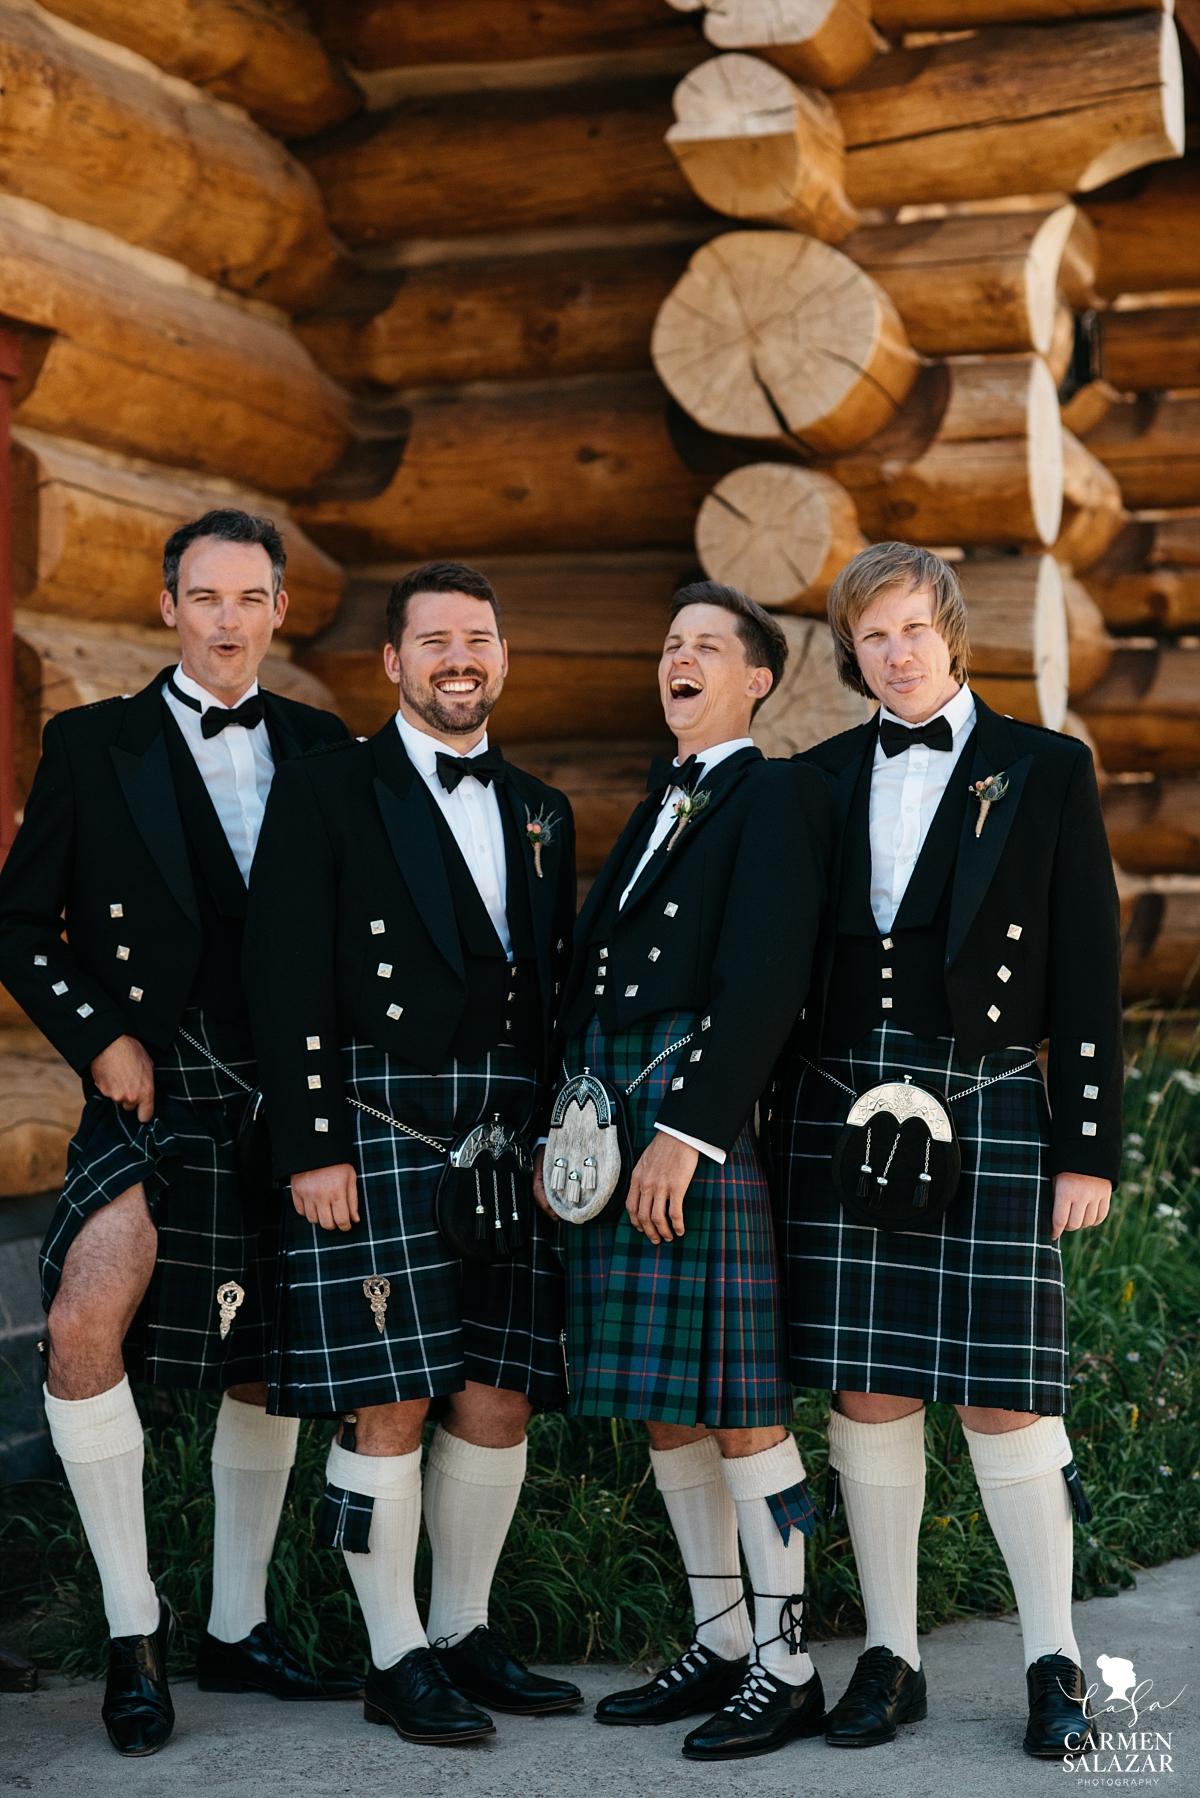 Silly groomsmen in kilts at Hideout - Carmen Salazar